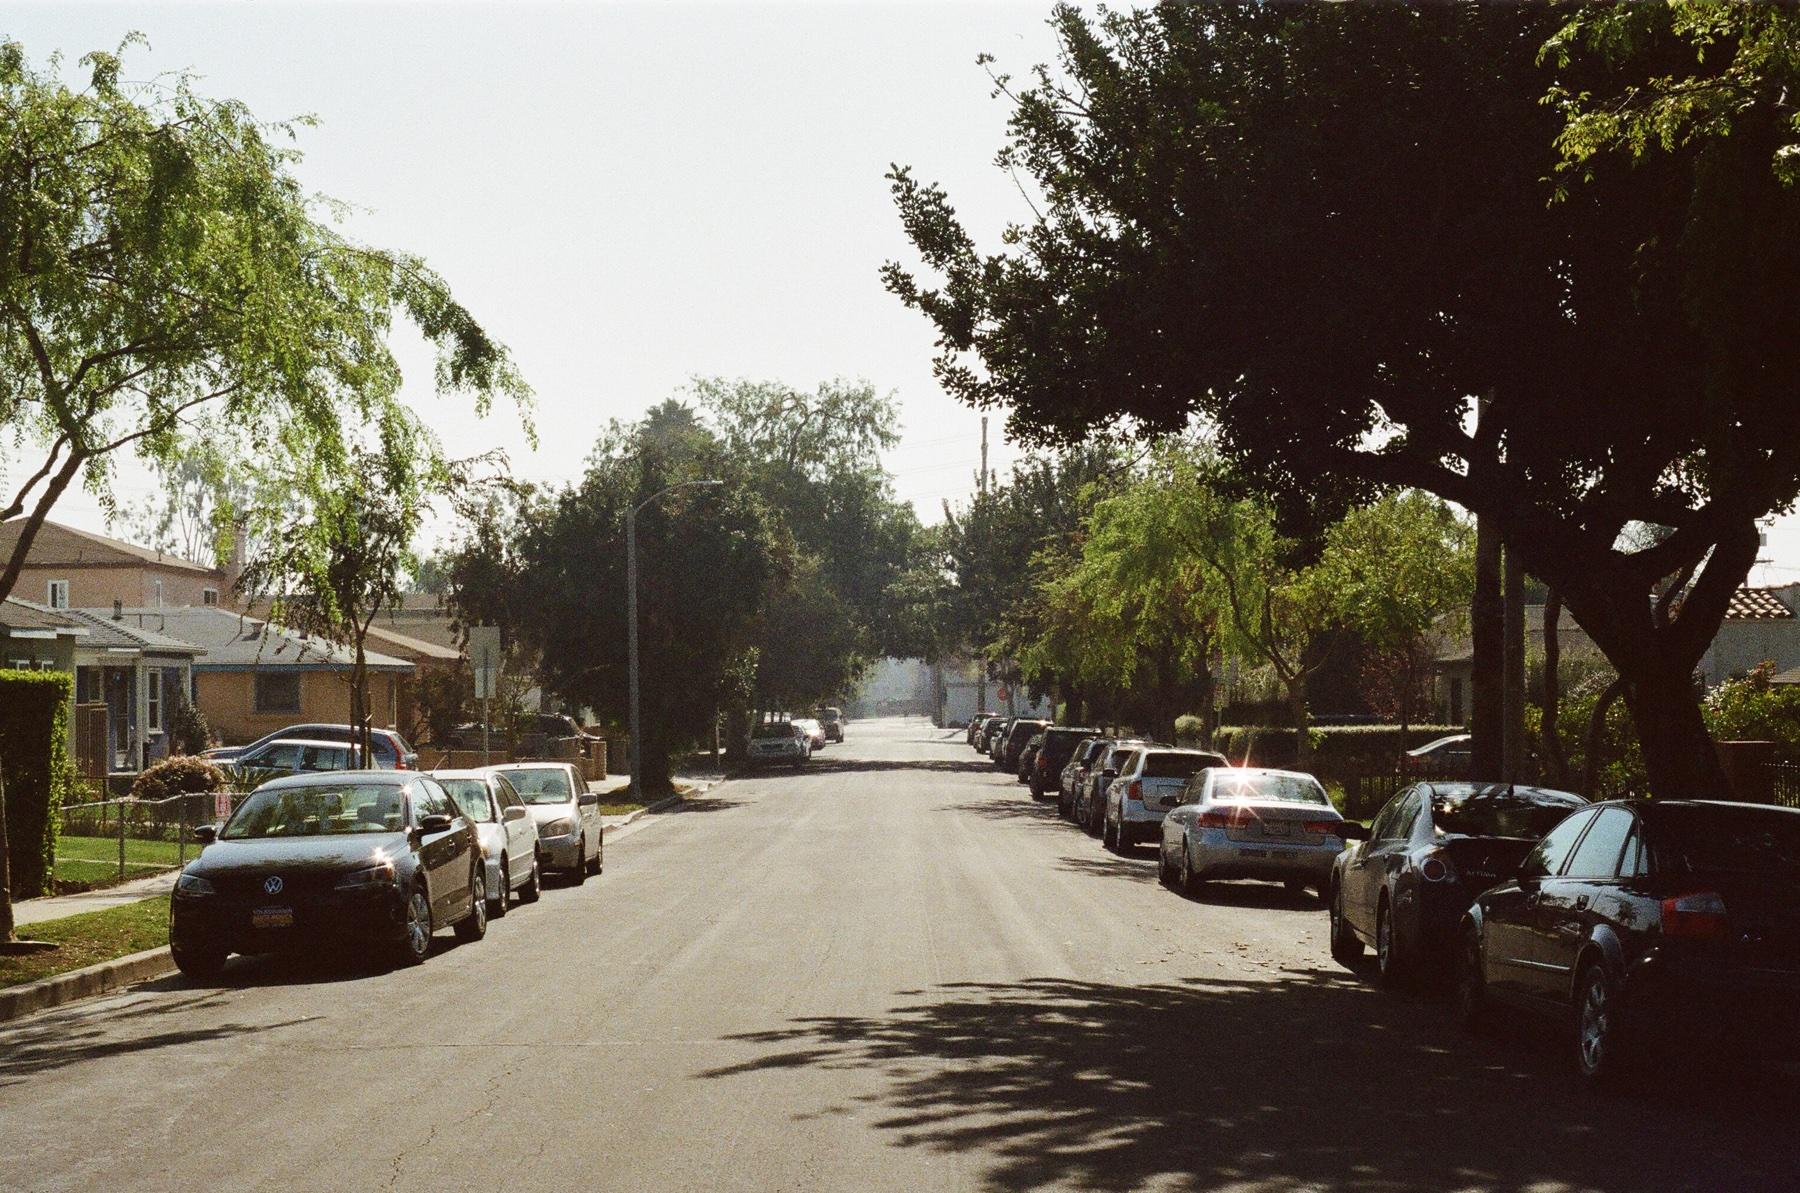 tree-road-street-house-sidewalk-town-949438-pxhere.com